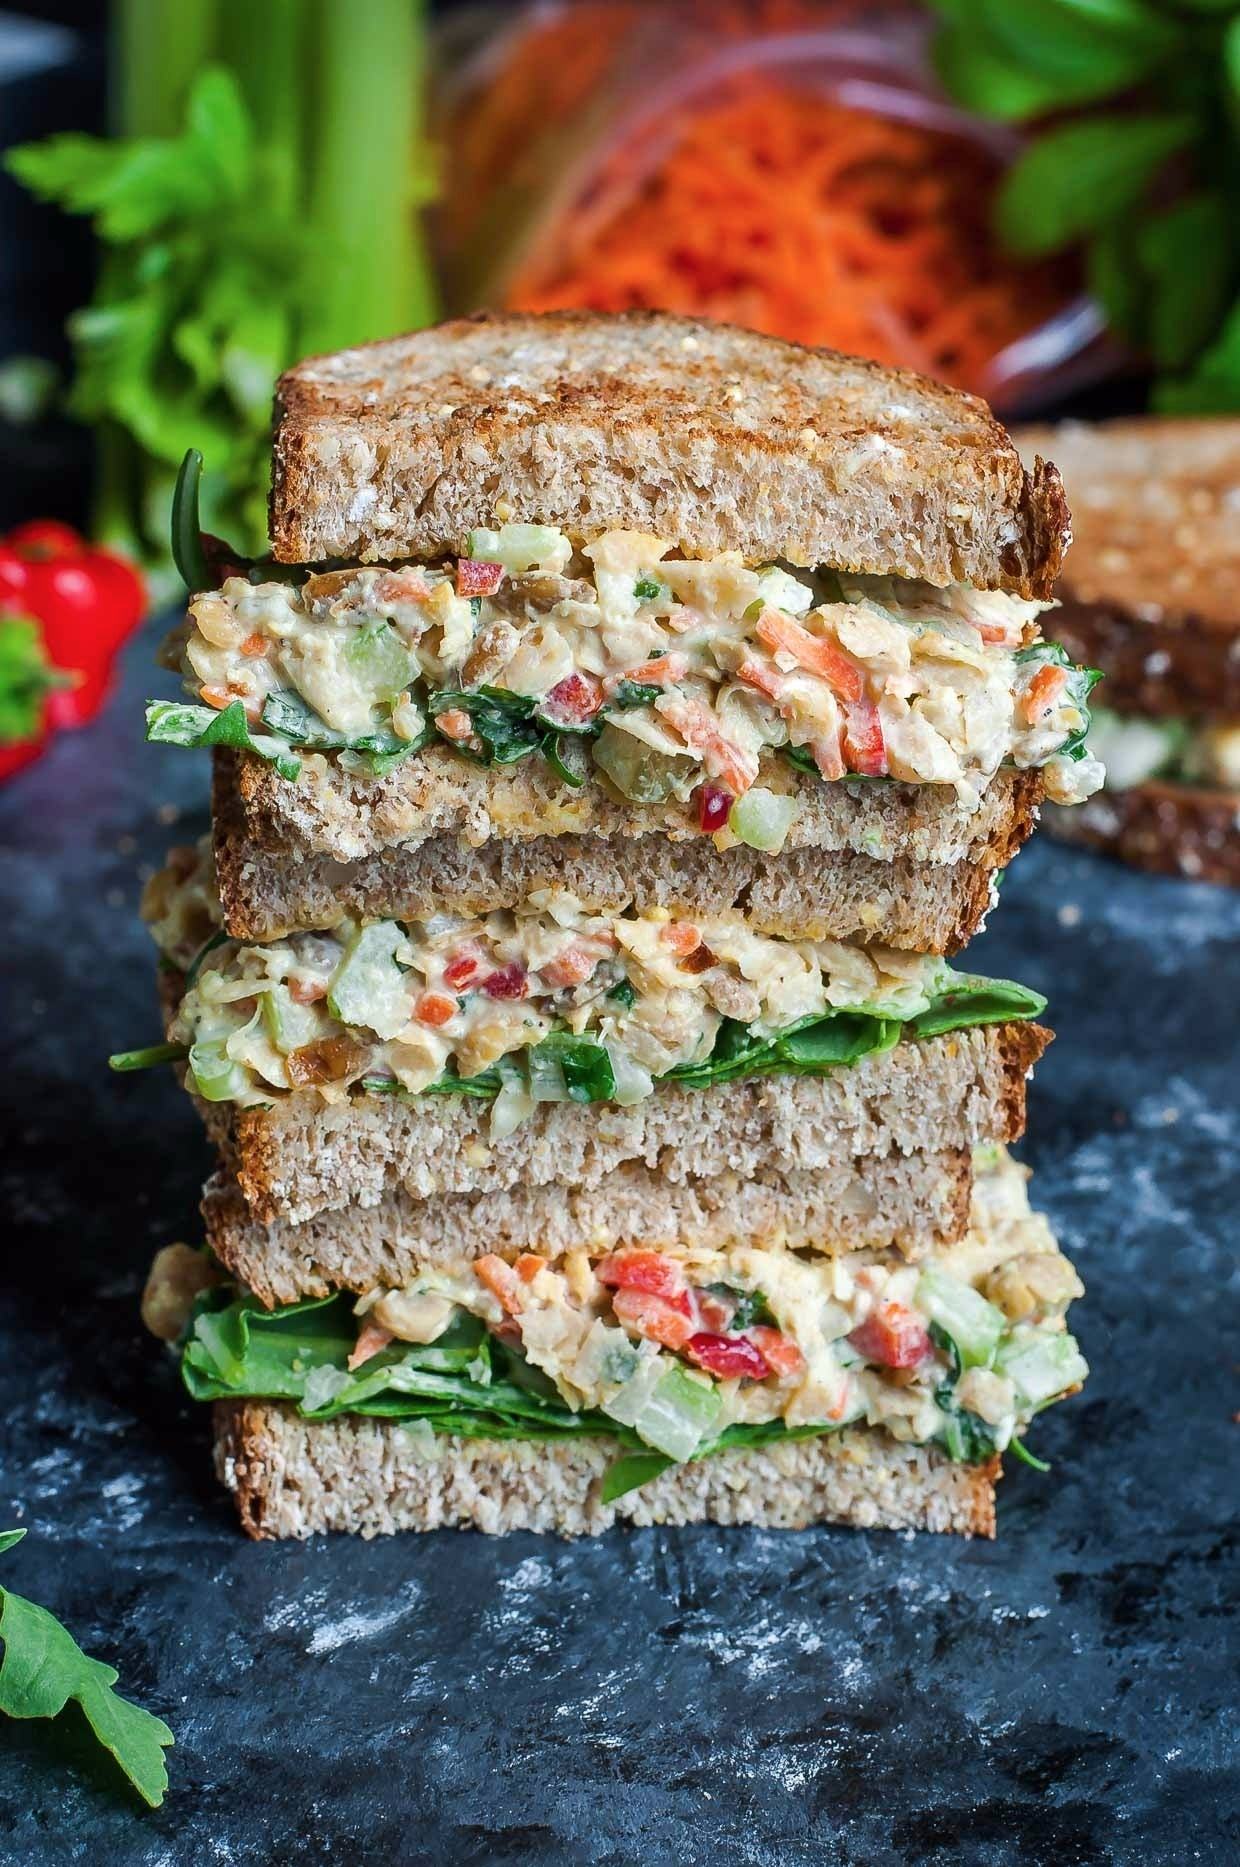 healthy-vegetarian-garden-veggie-chickpea-salad-sandwich-recipe-peasandcrayons-1196